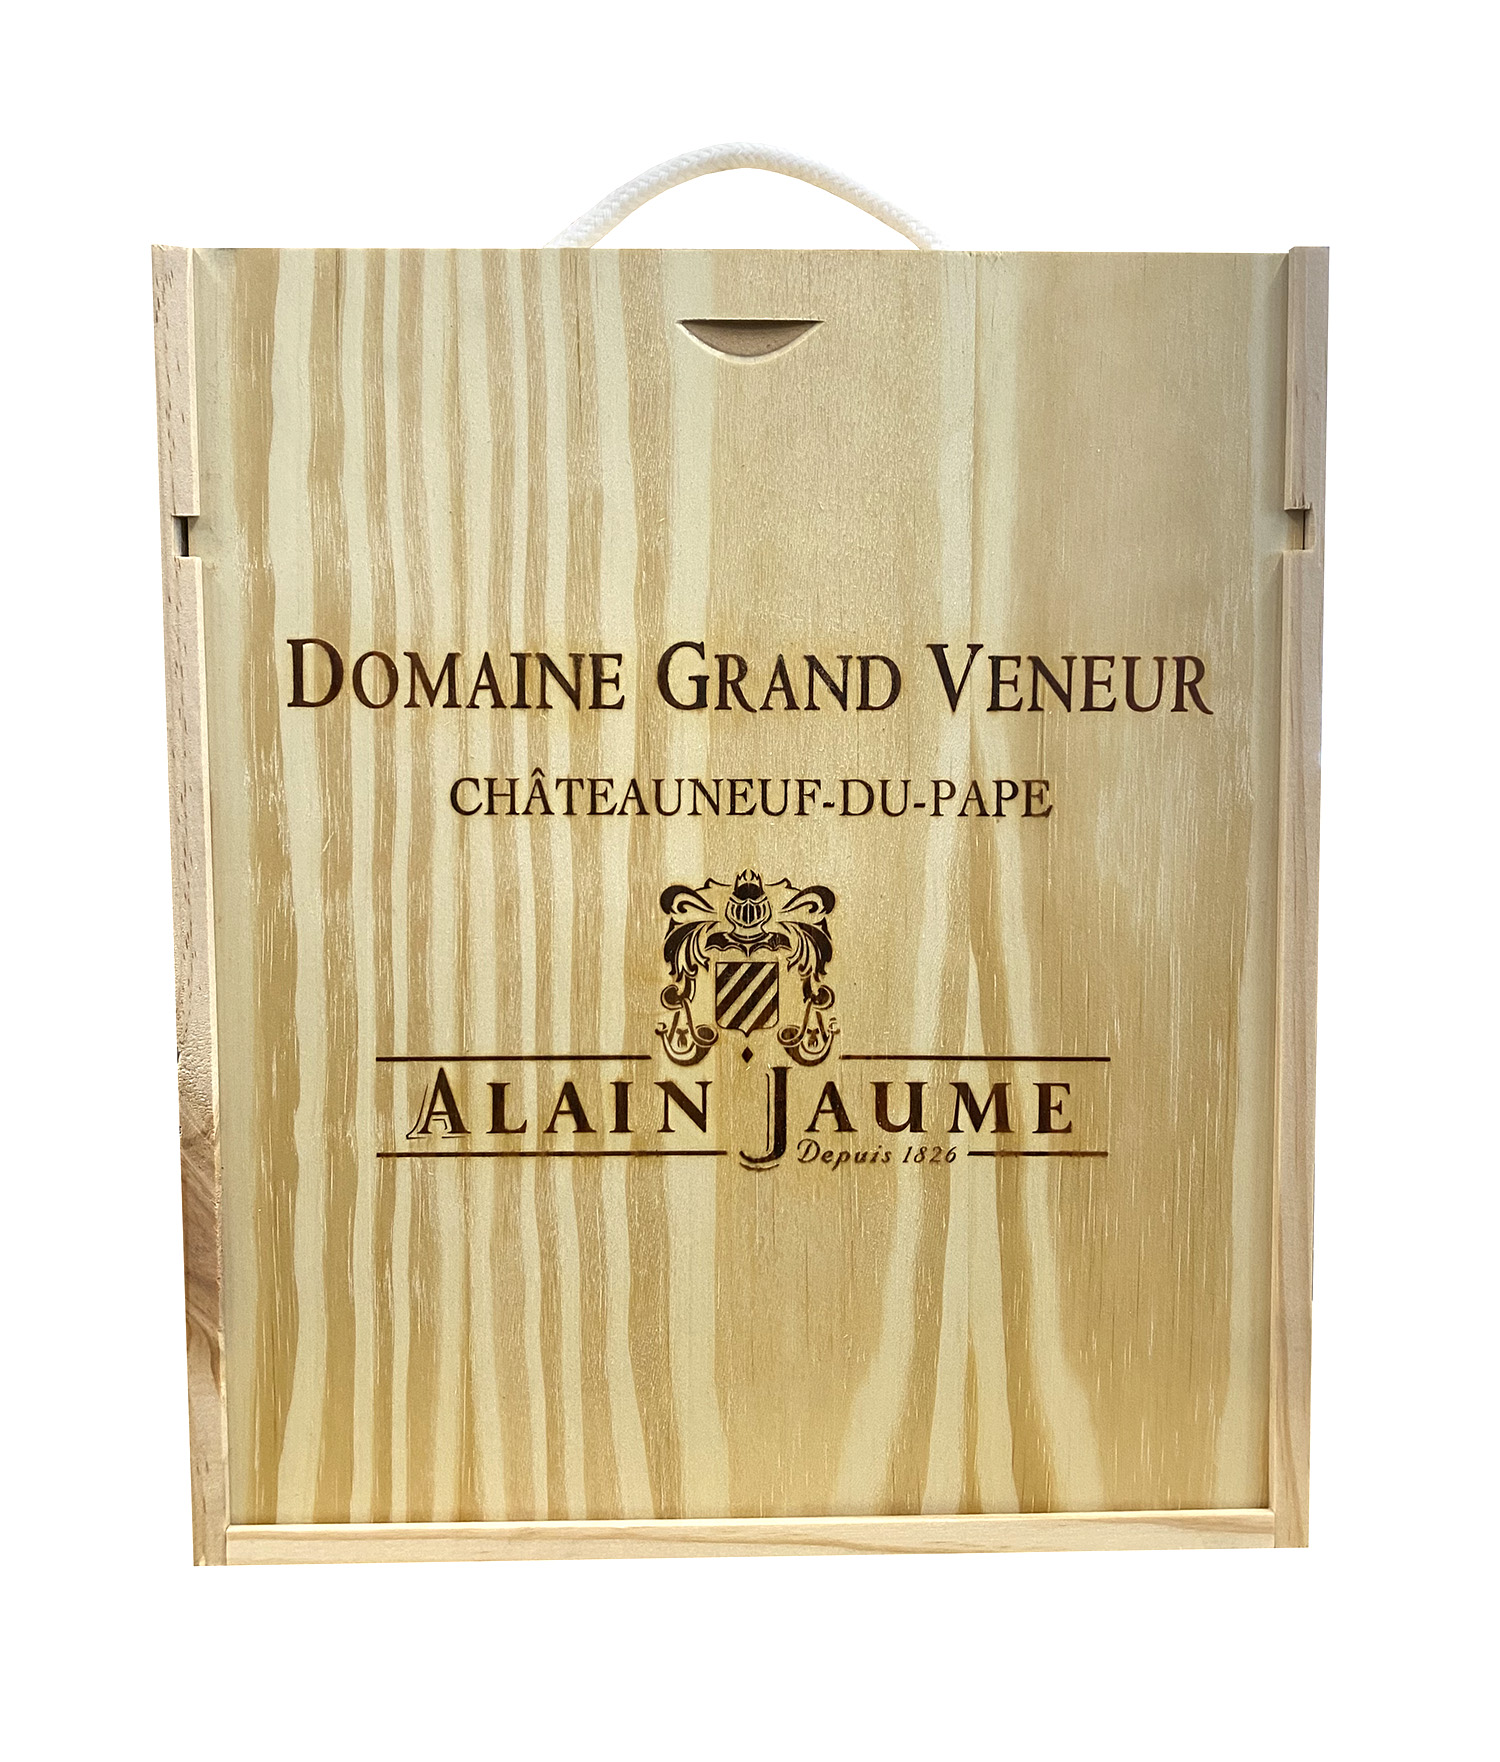 Alain Jaume Dřevěná krabička Domaine Grand Veneur uzavřená